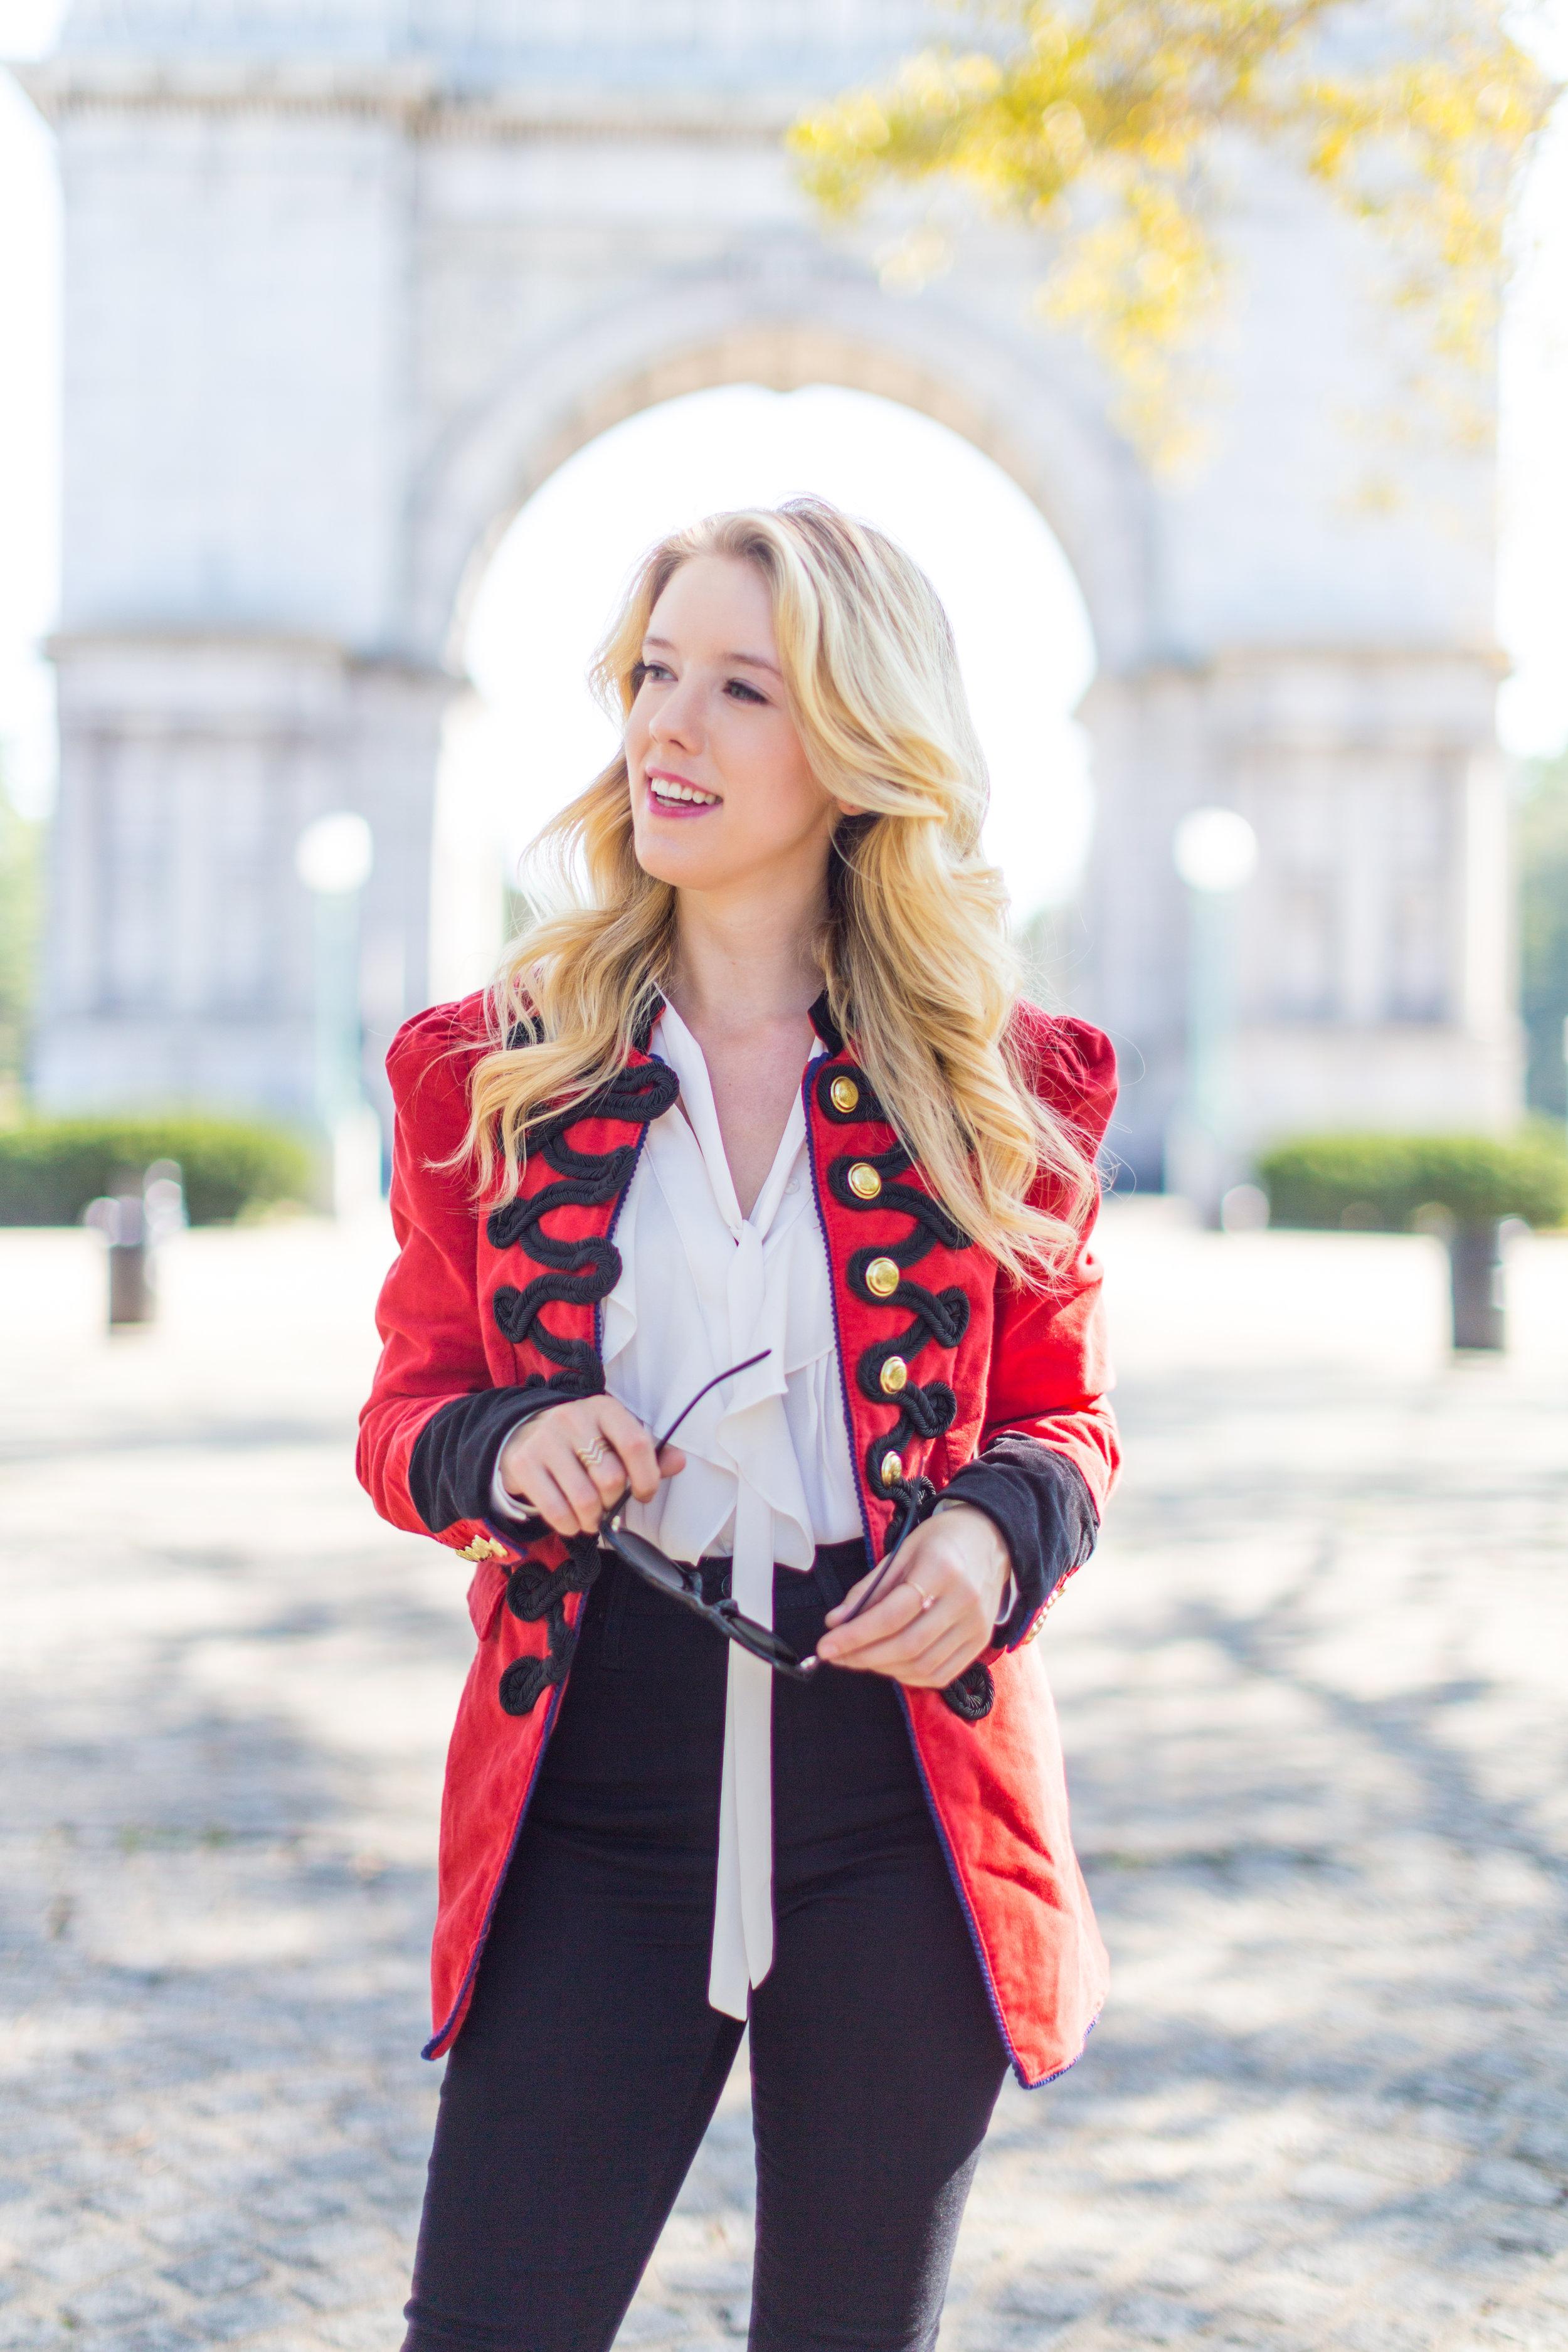 Fall Fashion Red Band Jacket Trendy-5.jpg